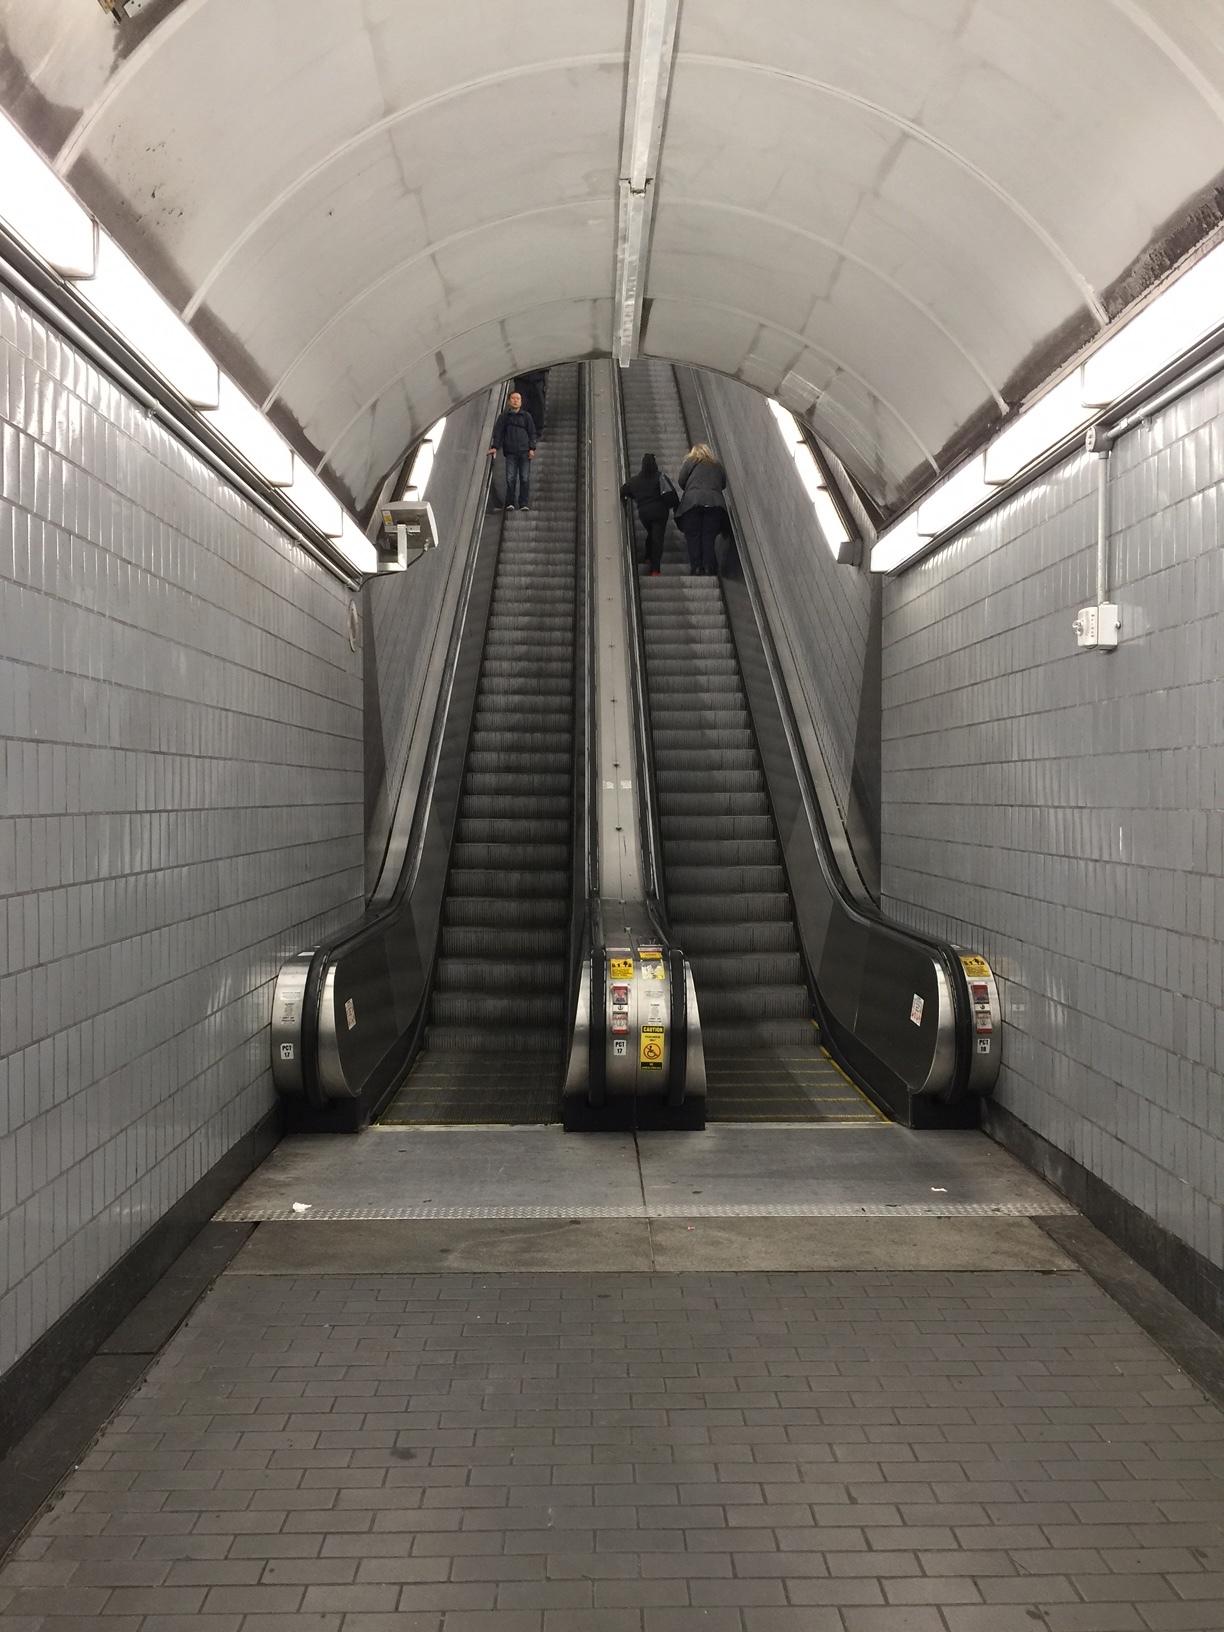 Go up the long, long escalator.